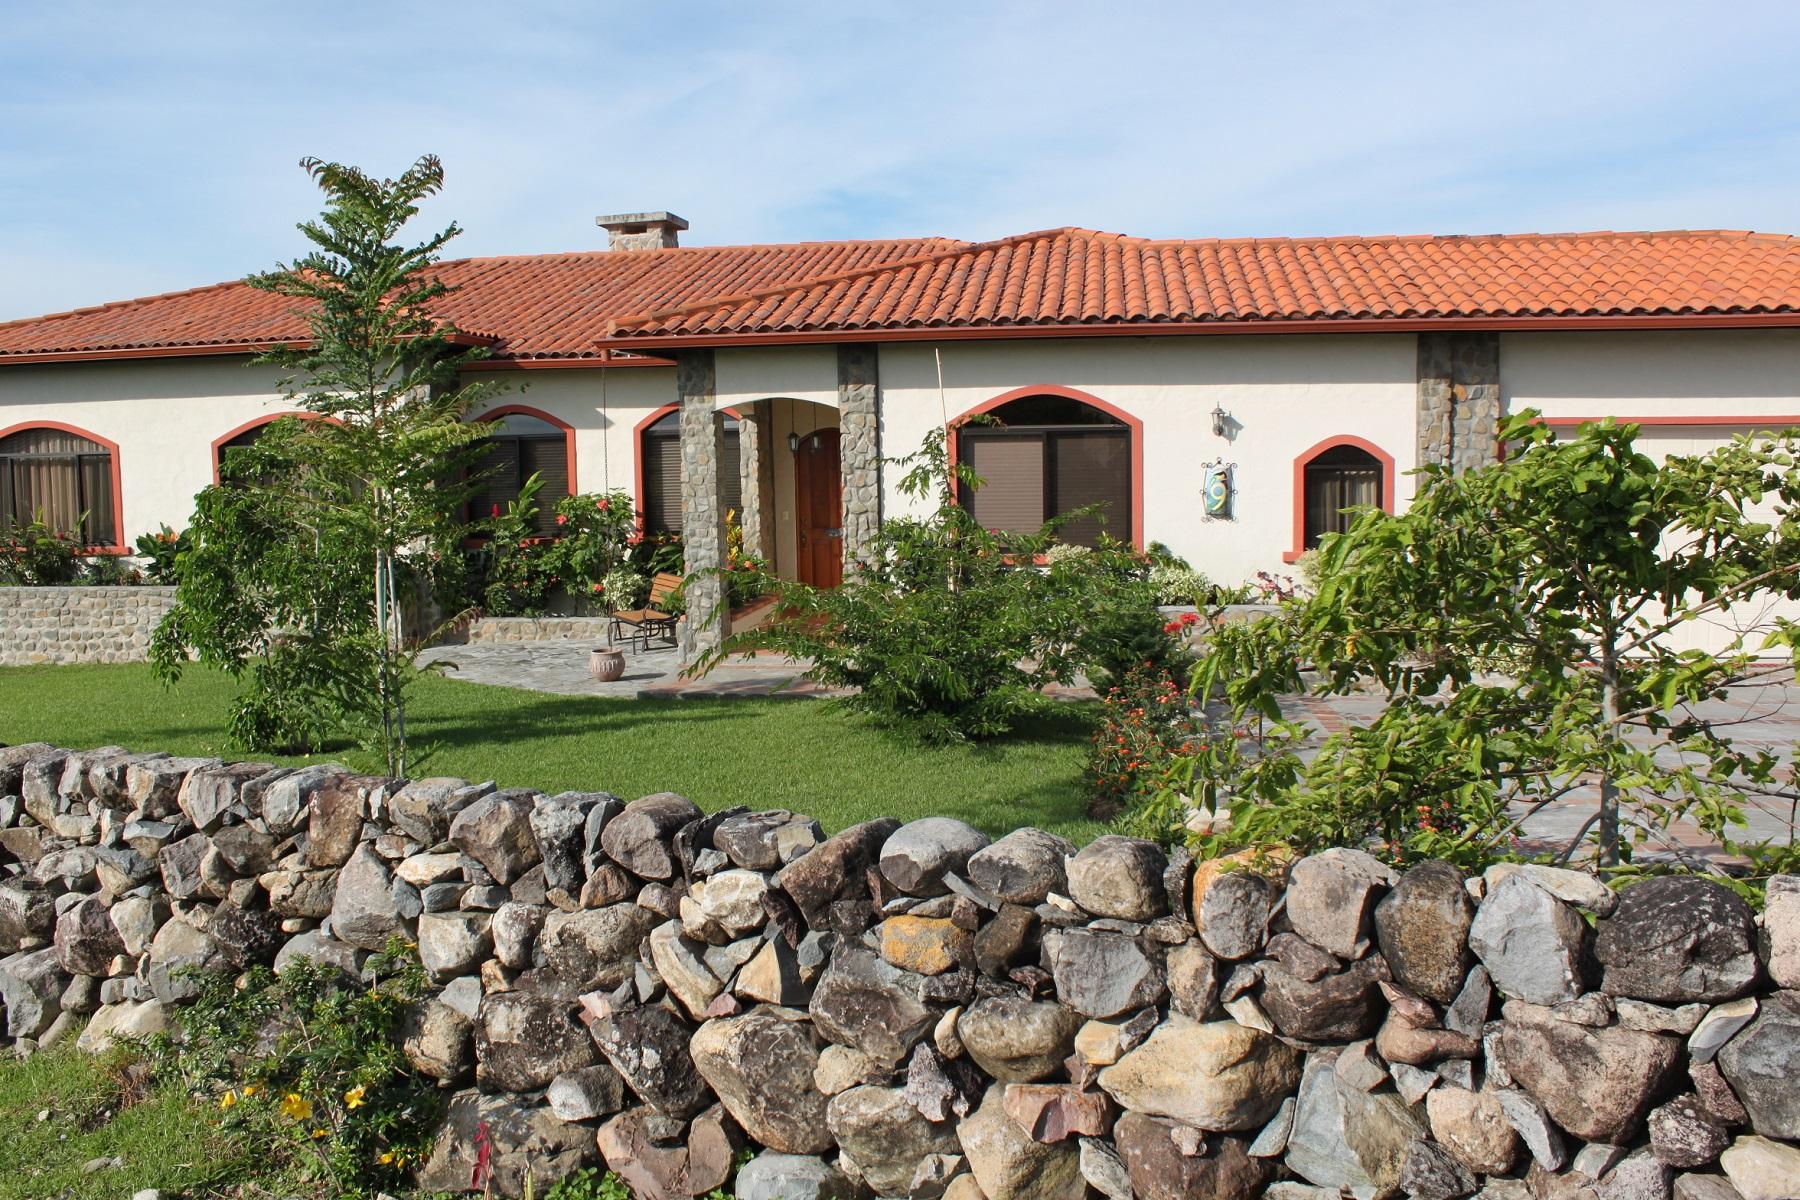 Single Family Home for Sale at Hacienda Los Molinos Panama City, Panama, Panama